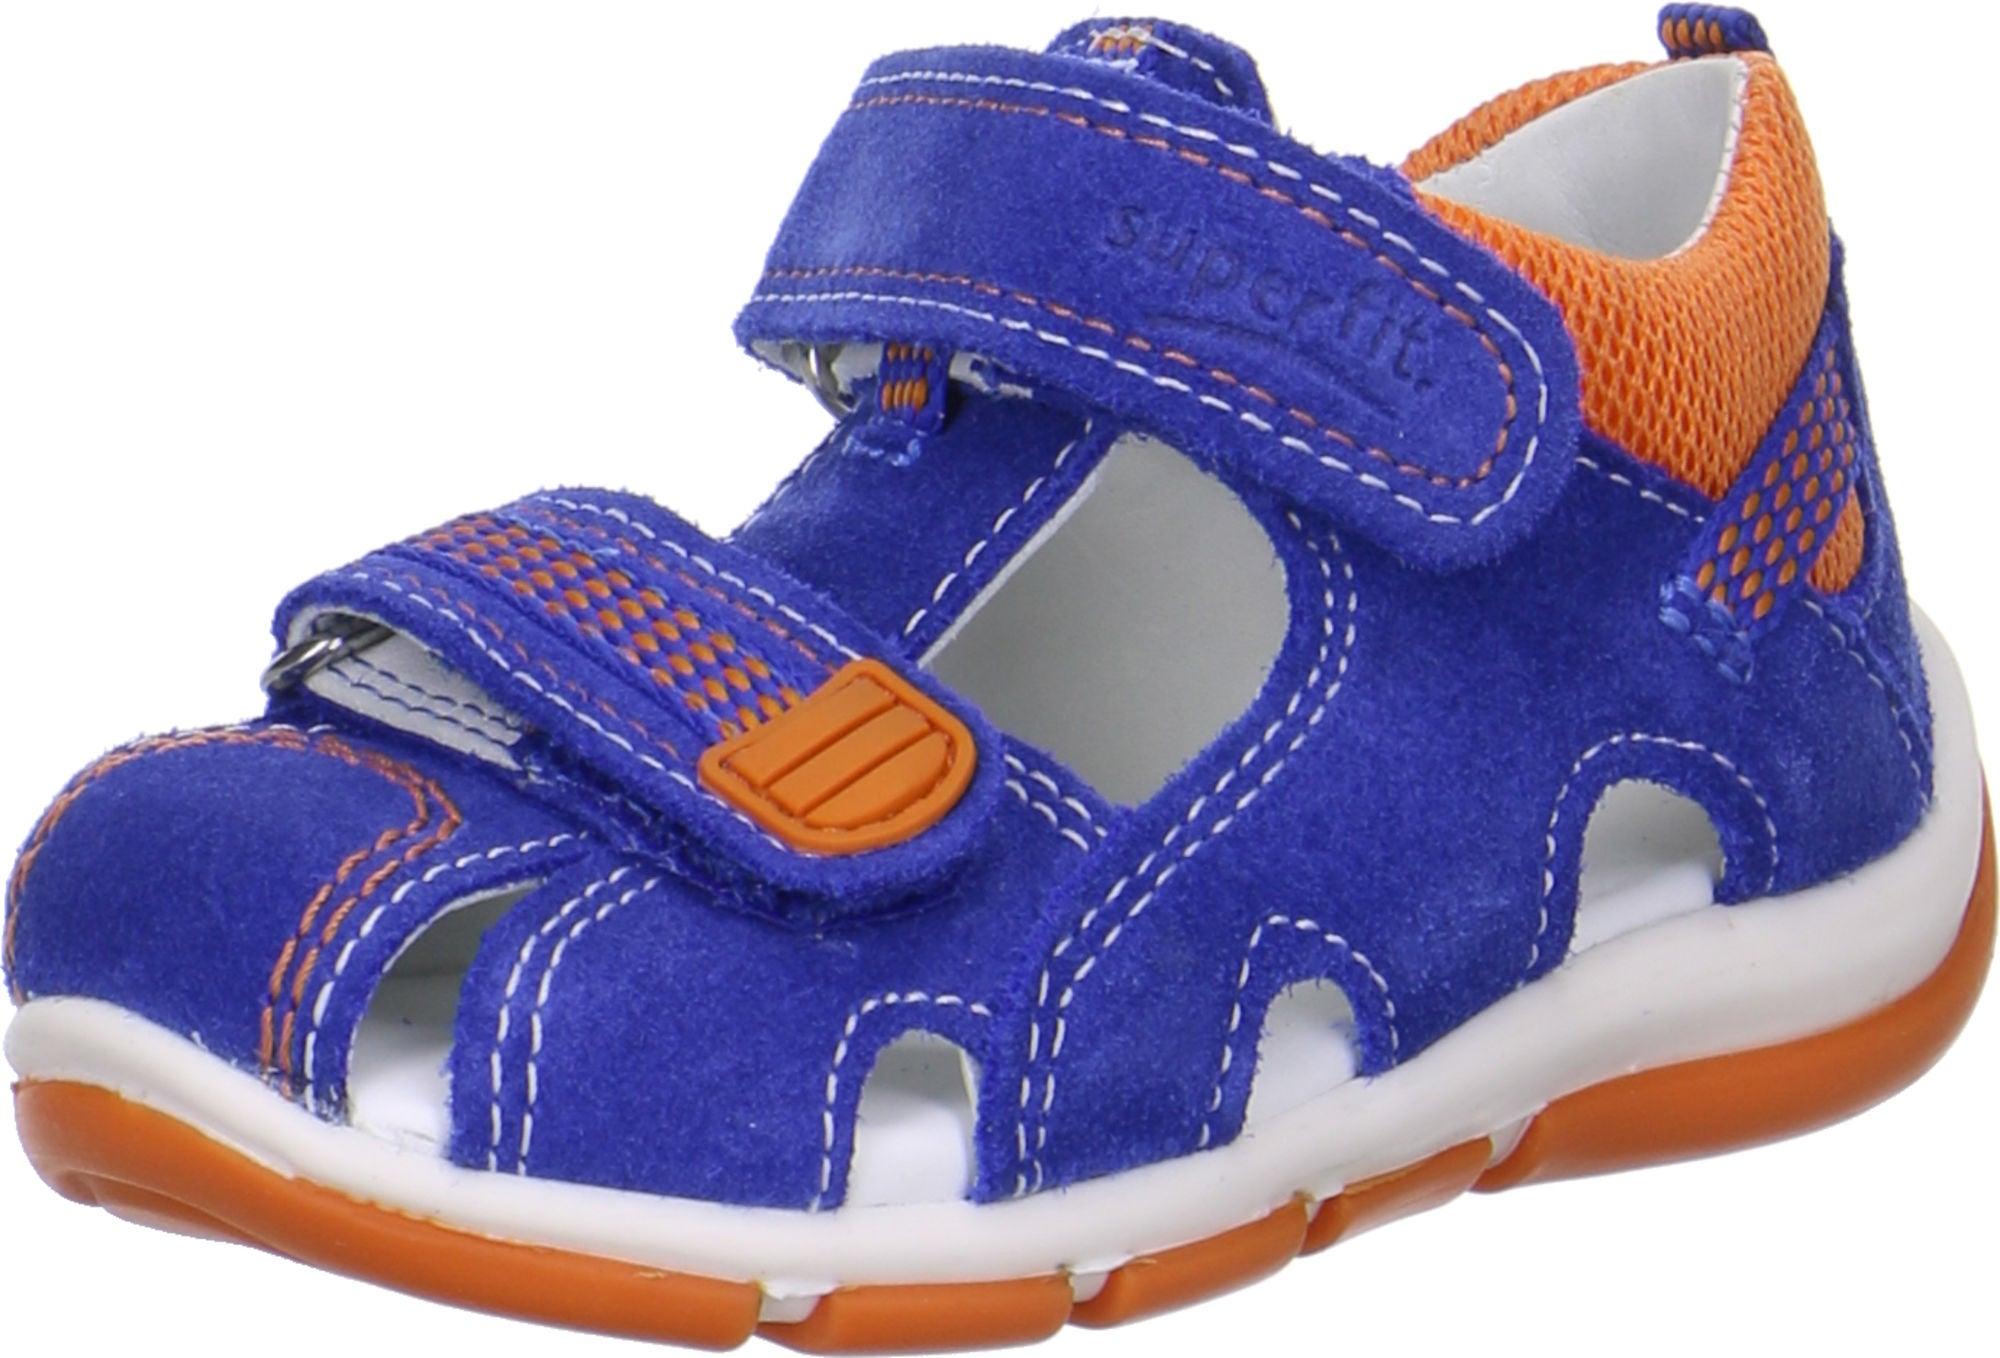 sandals Sandalen superfit boys sandal Freddy blue orange